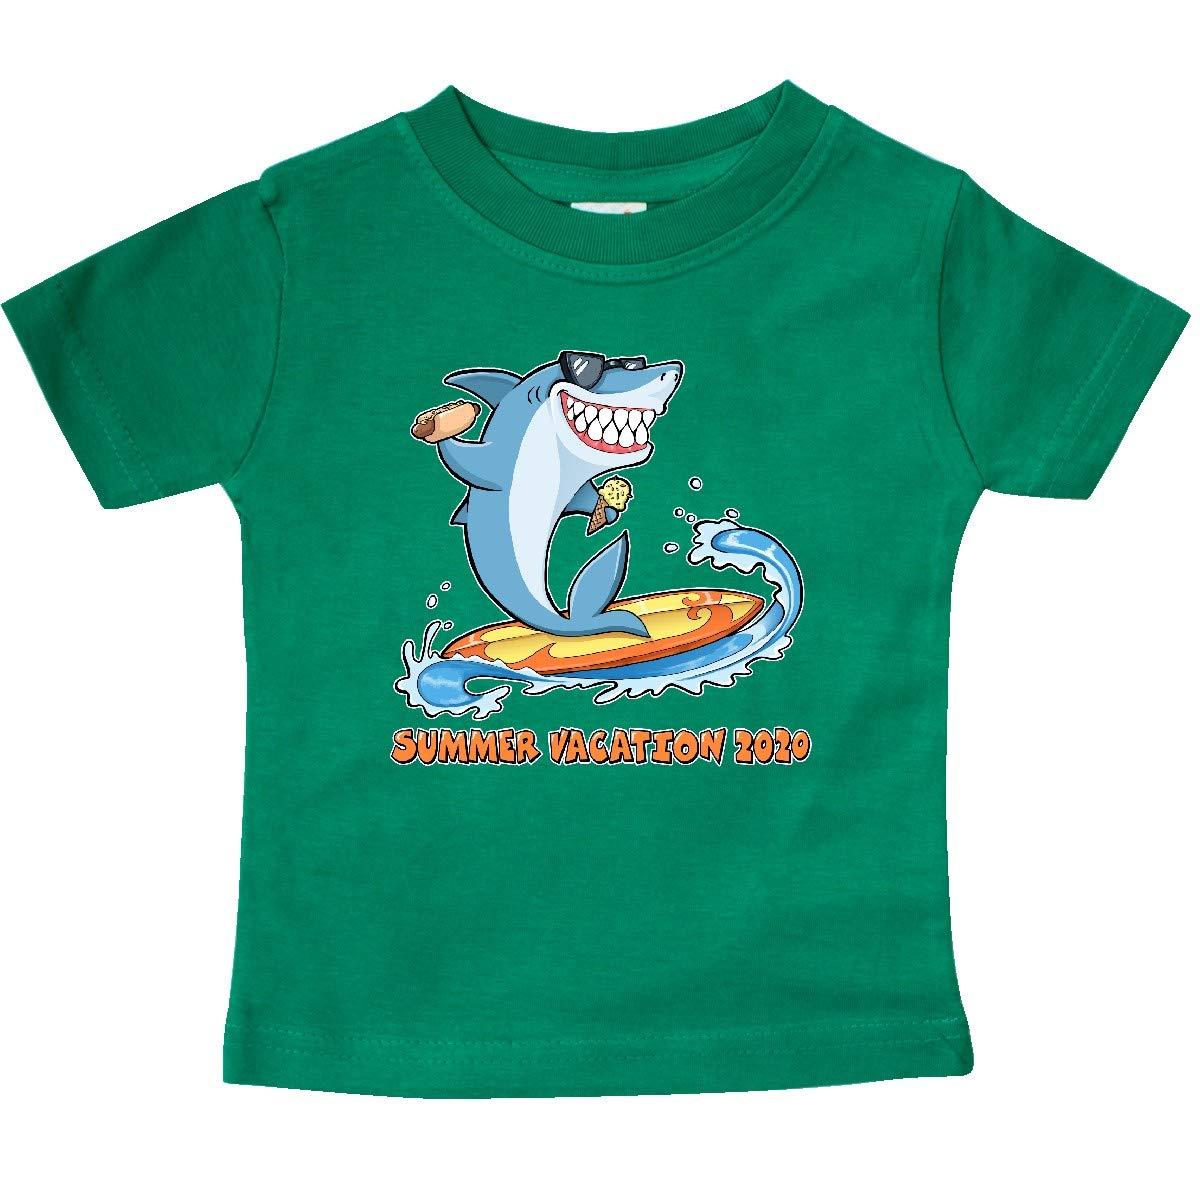 Shark on a Surfboard Baby T-Shirt 363f3 inktastic Summer Vacation 2020